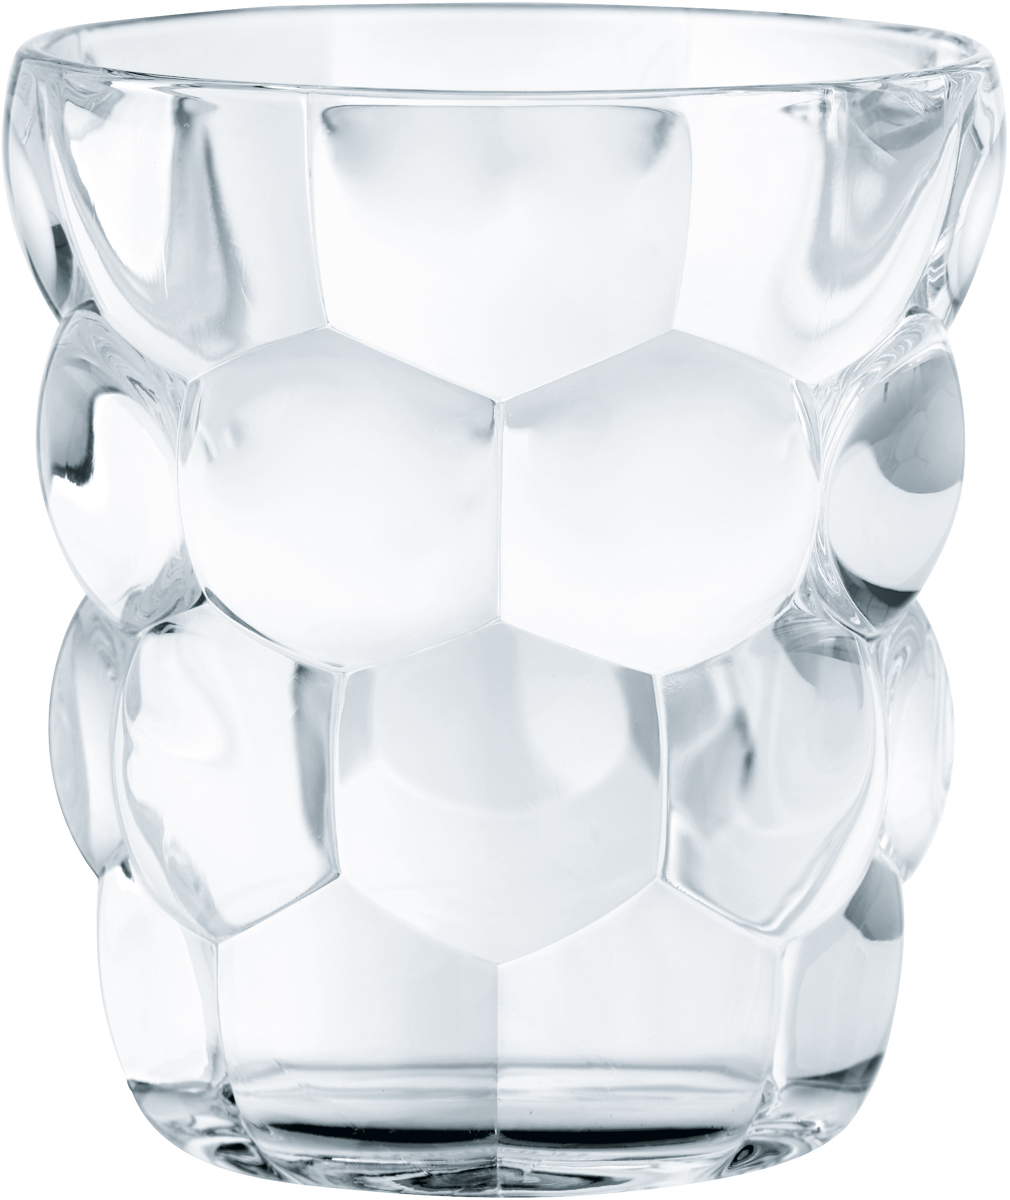 Набор стаканов Nachtmann Bubbles, 315 мл, 4 шт